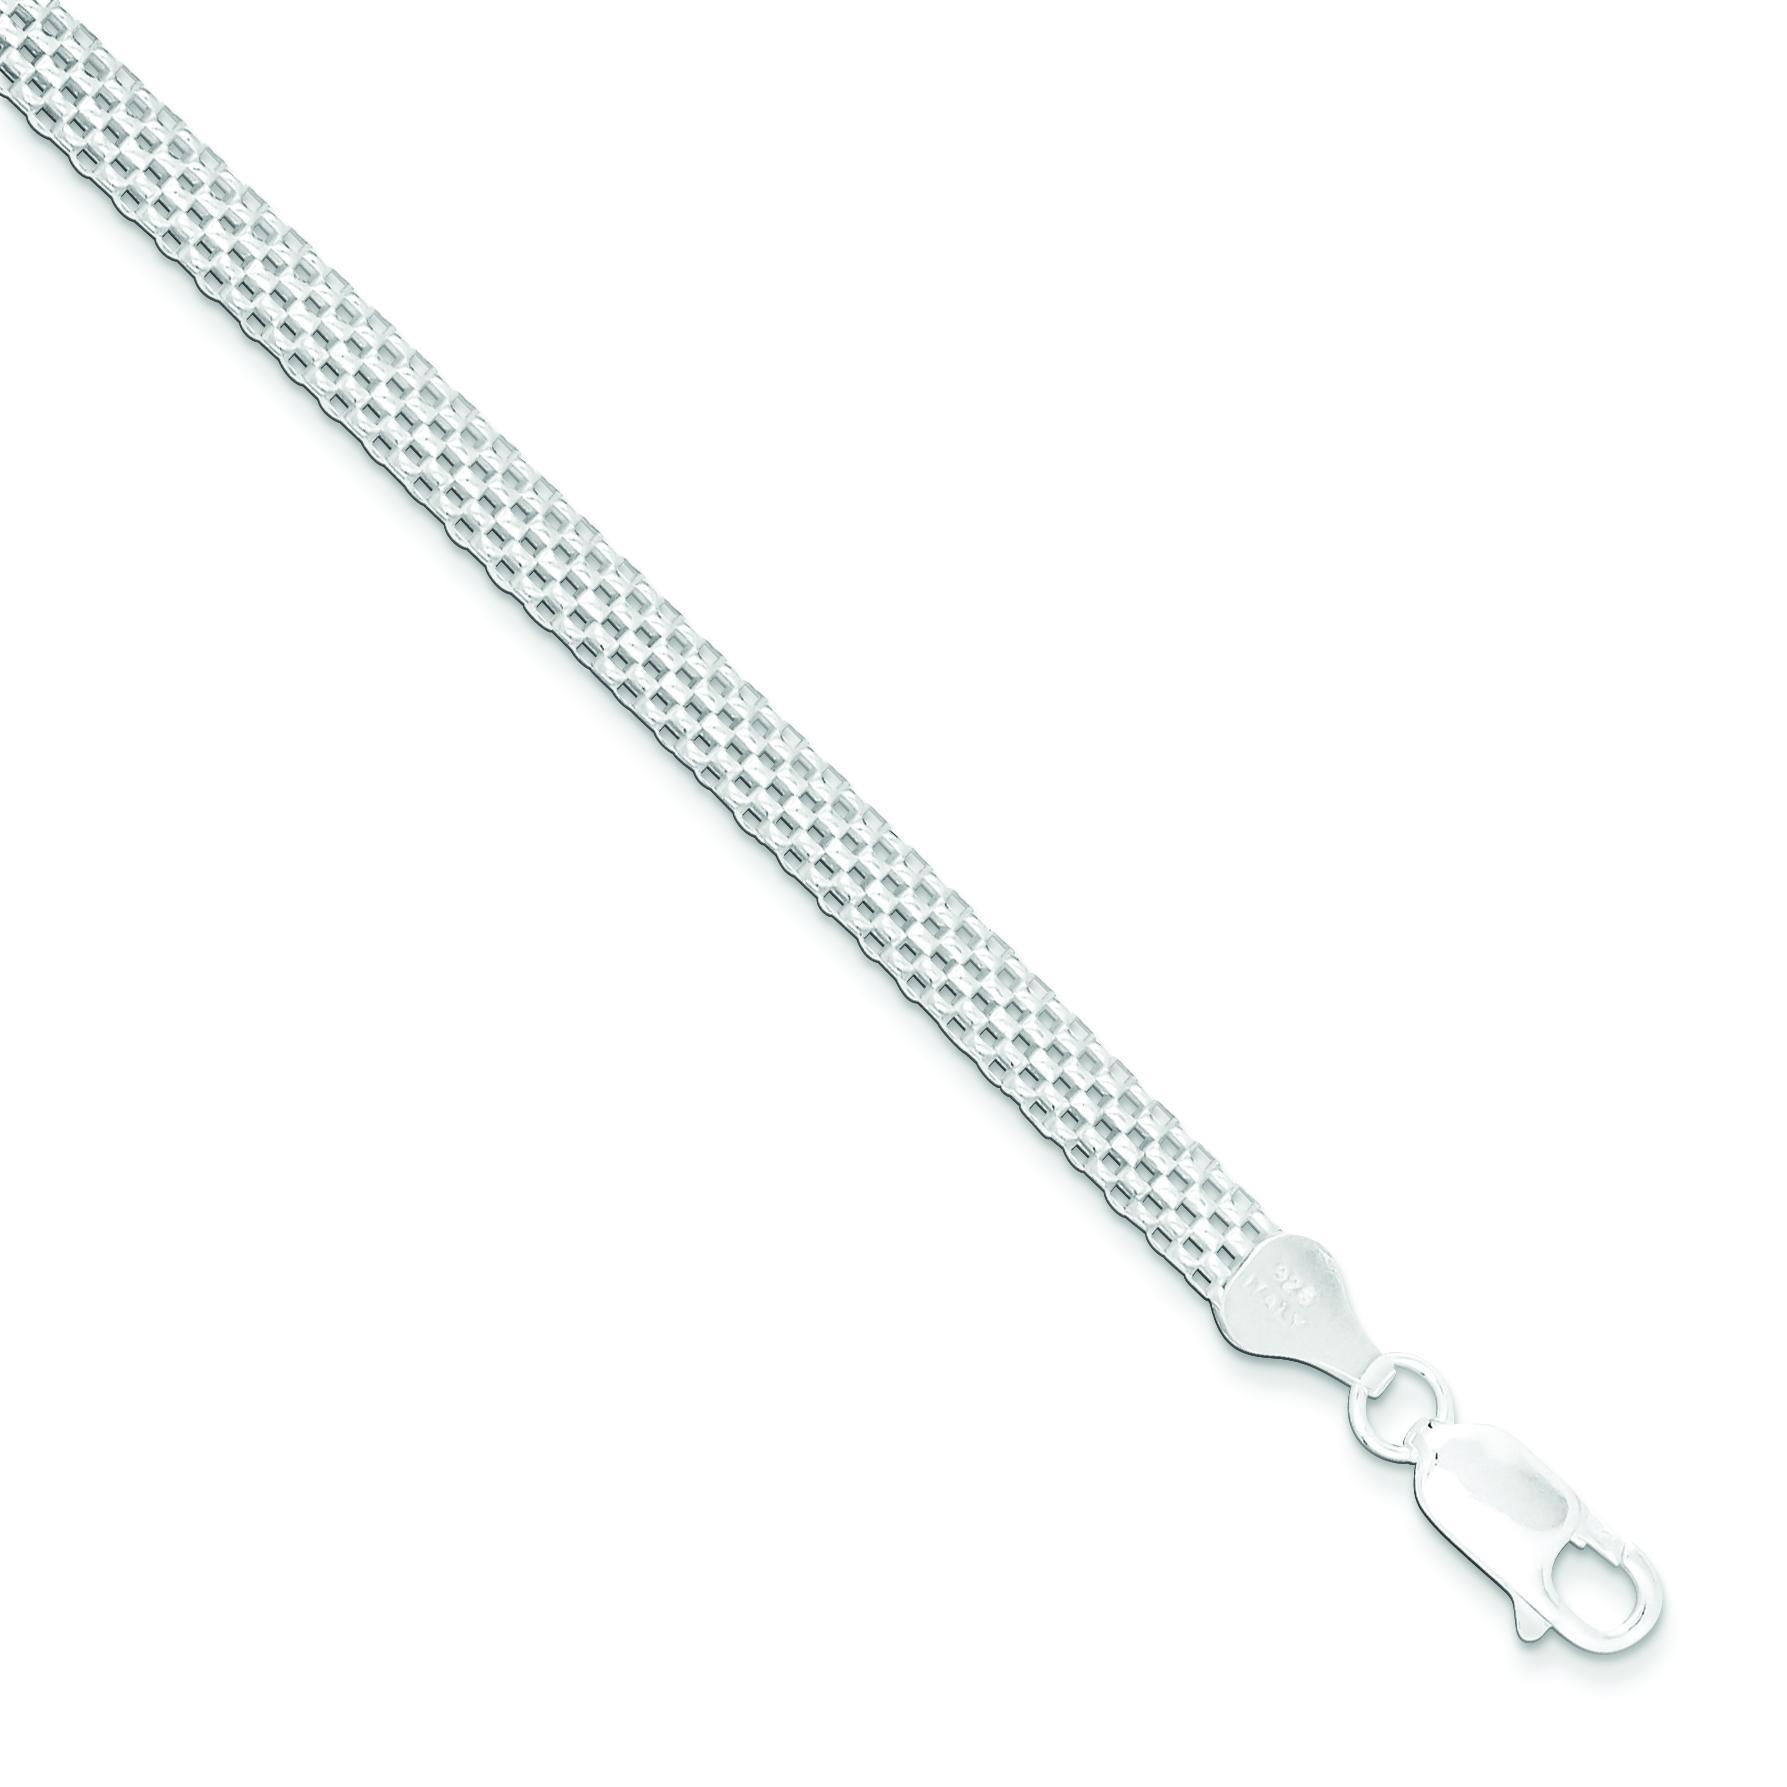 5mm Mesh Bracelet in Sterling Silver